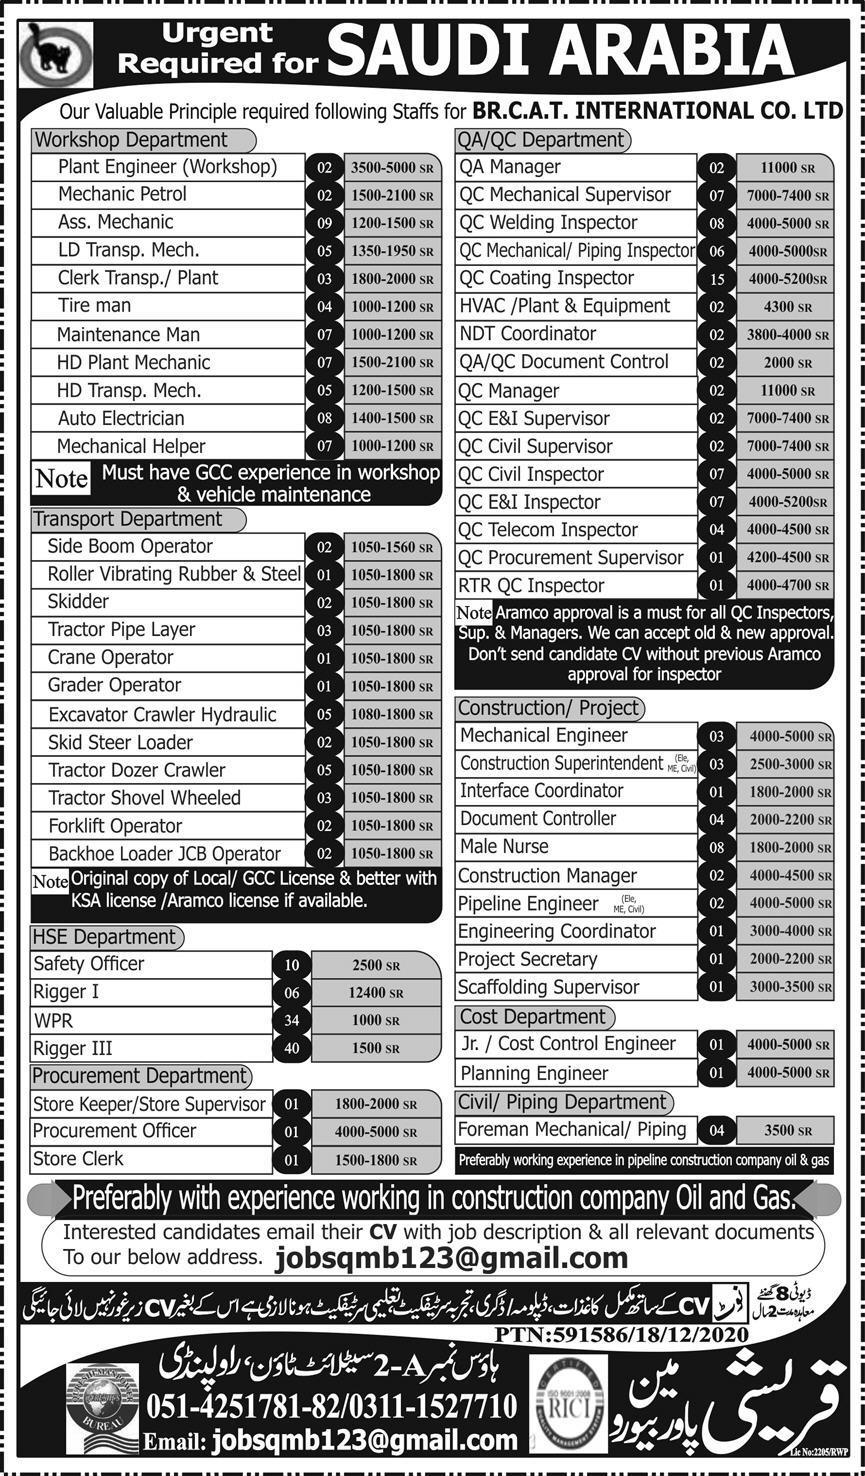 BR CAT International Company Limited Jobs 2021 in KSA